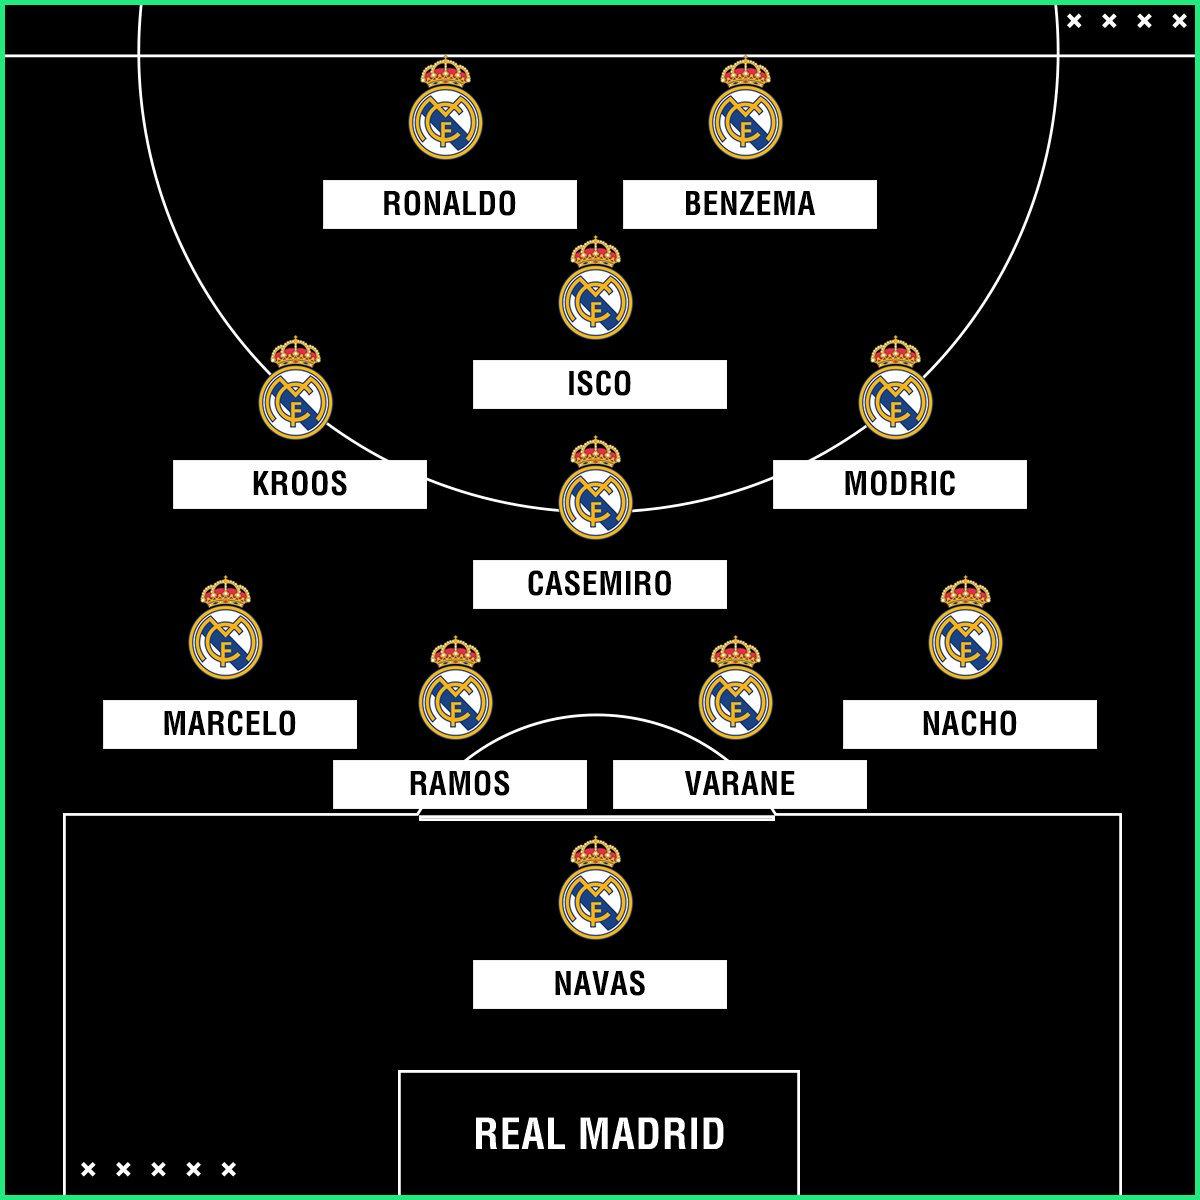 Goal Turkiye Ar Twitter Real Madrid In Psg Karsisindaki 11 I Belli Oldu